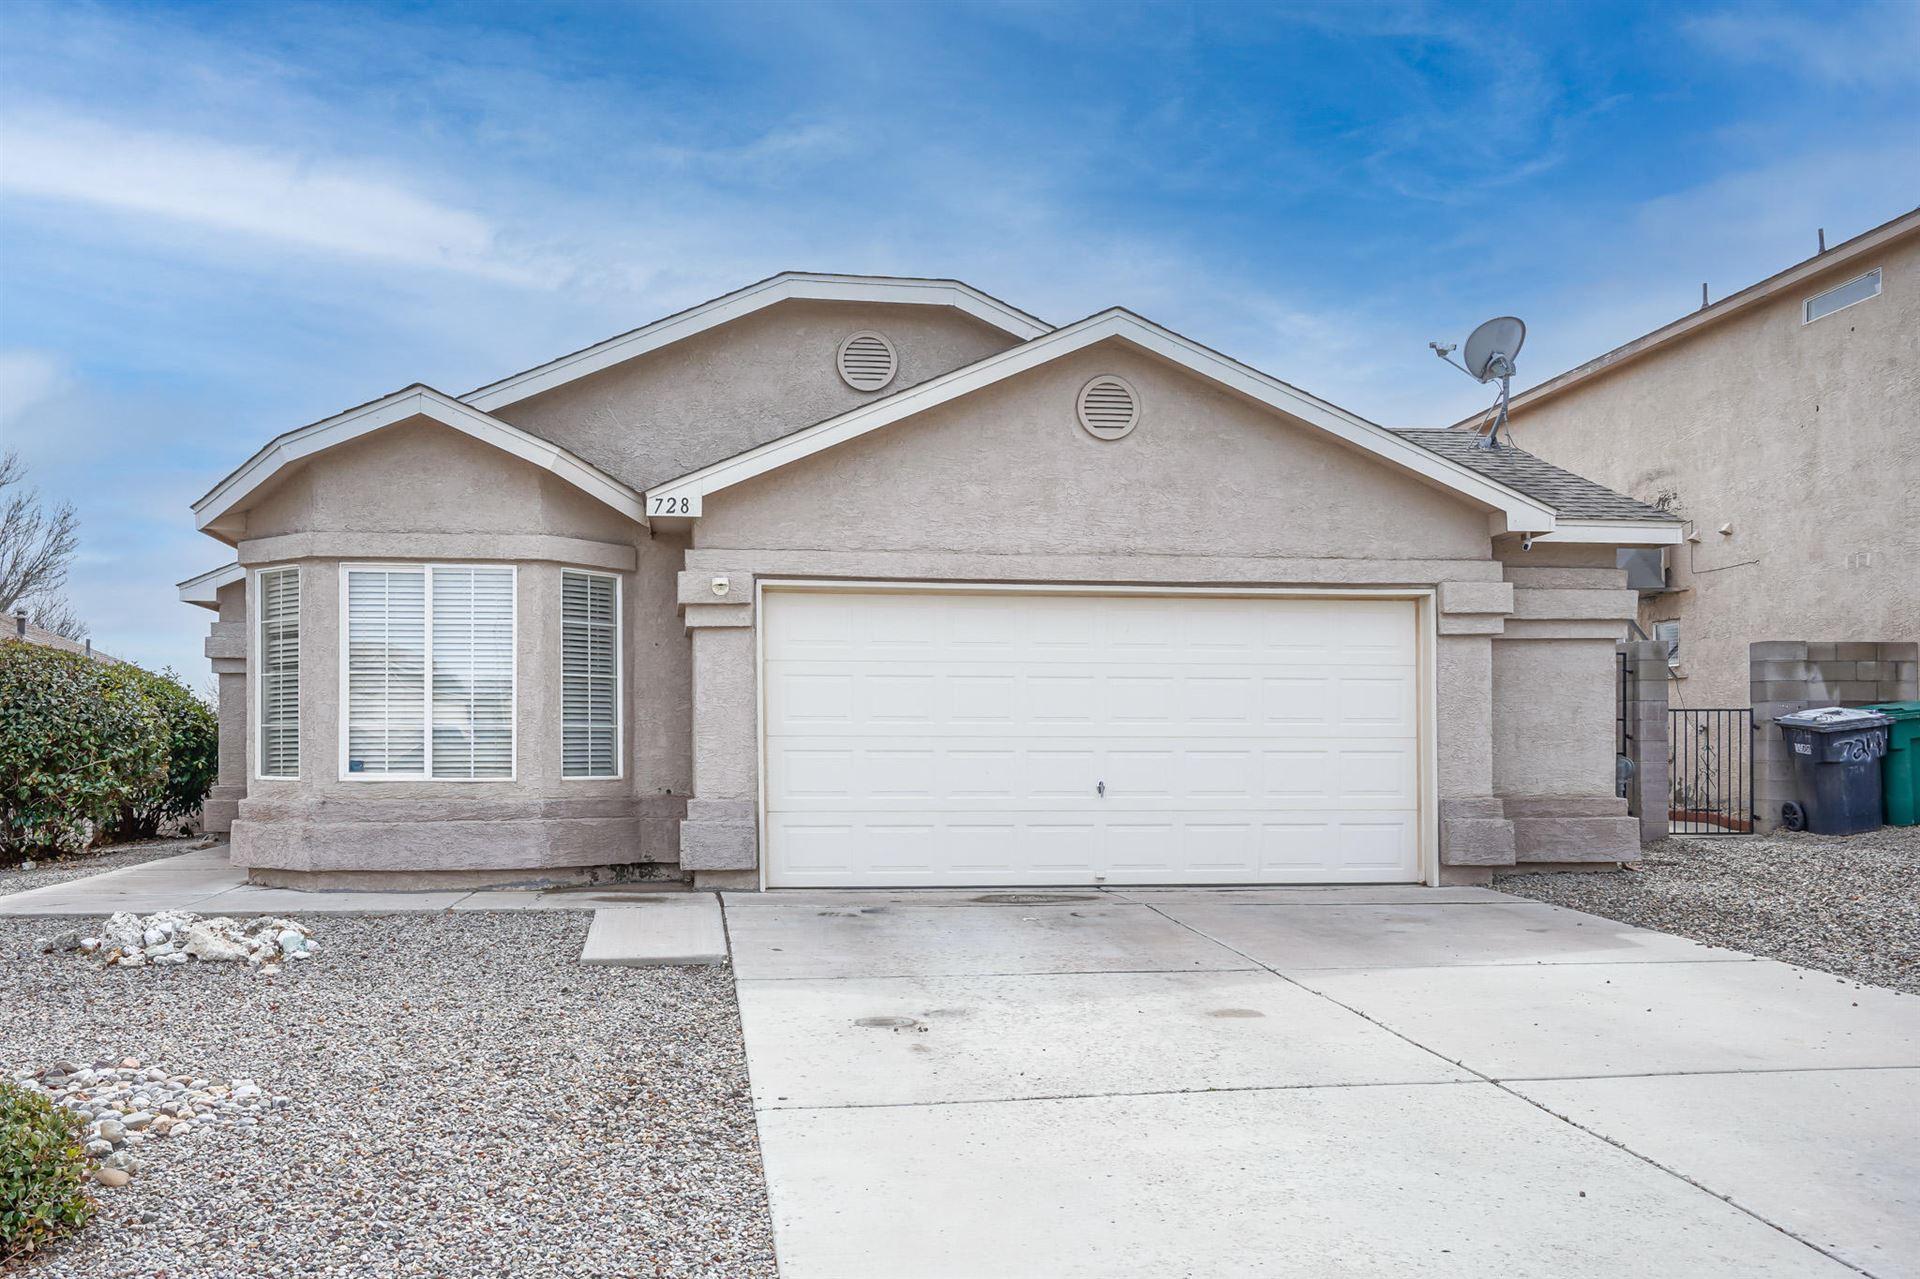 728 Ocate Meadows Drive NE, Rio Rancho, NM 87144 - MLS#: 988300